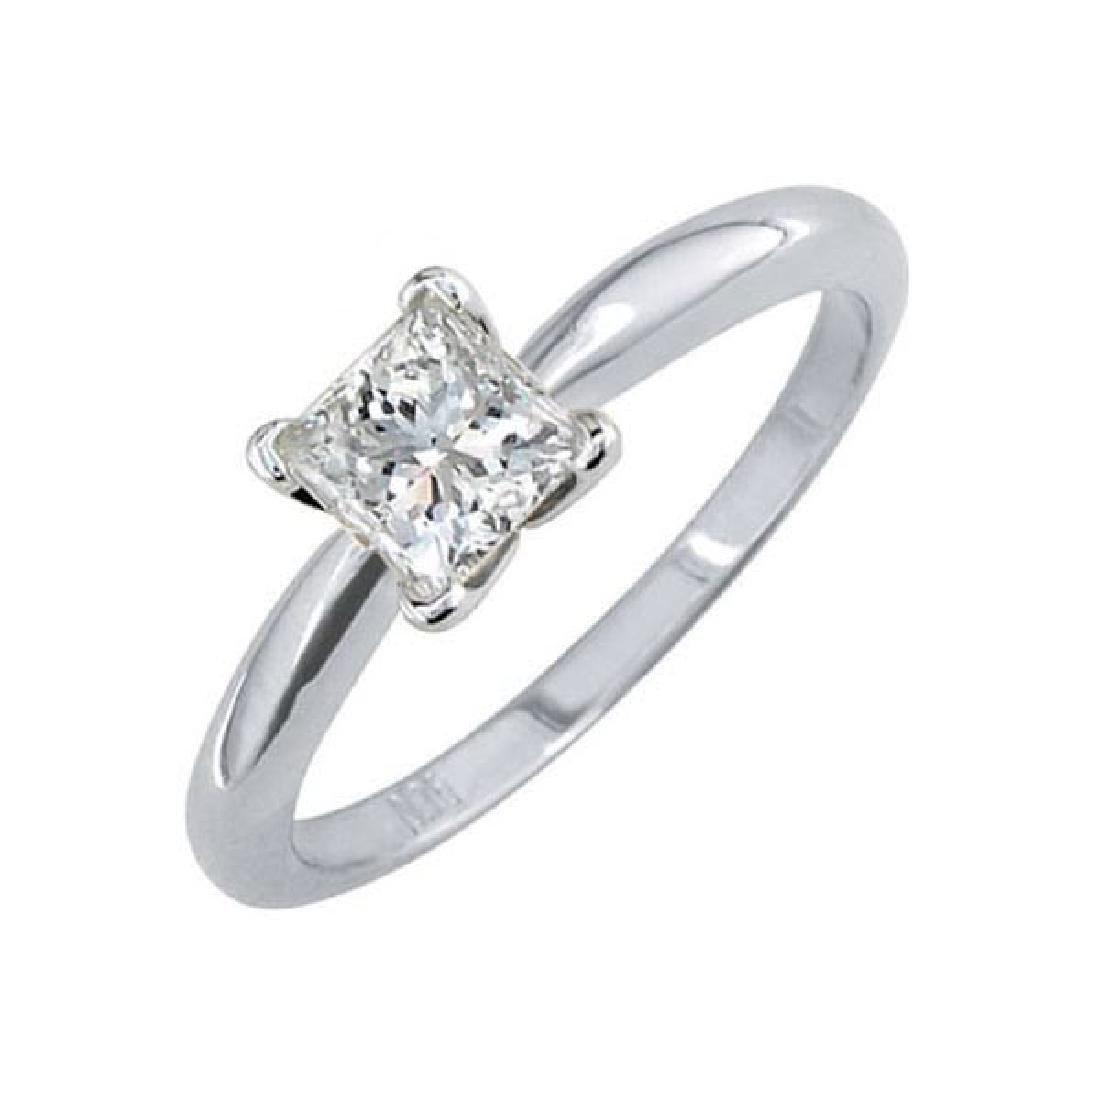 Certified 0.26 CTW Princess Diamond Solitaire 14k Ring